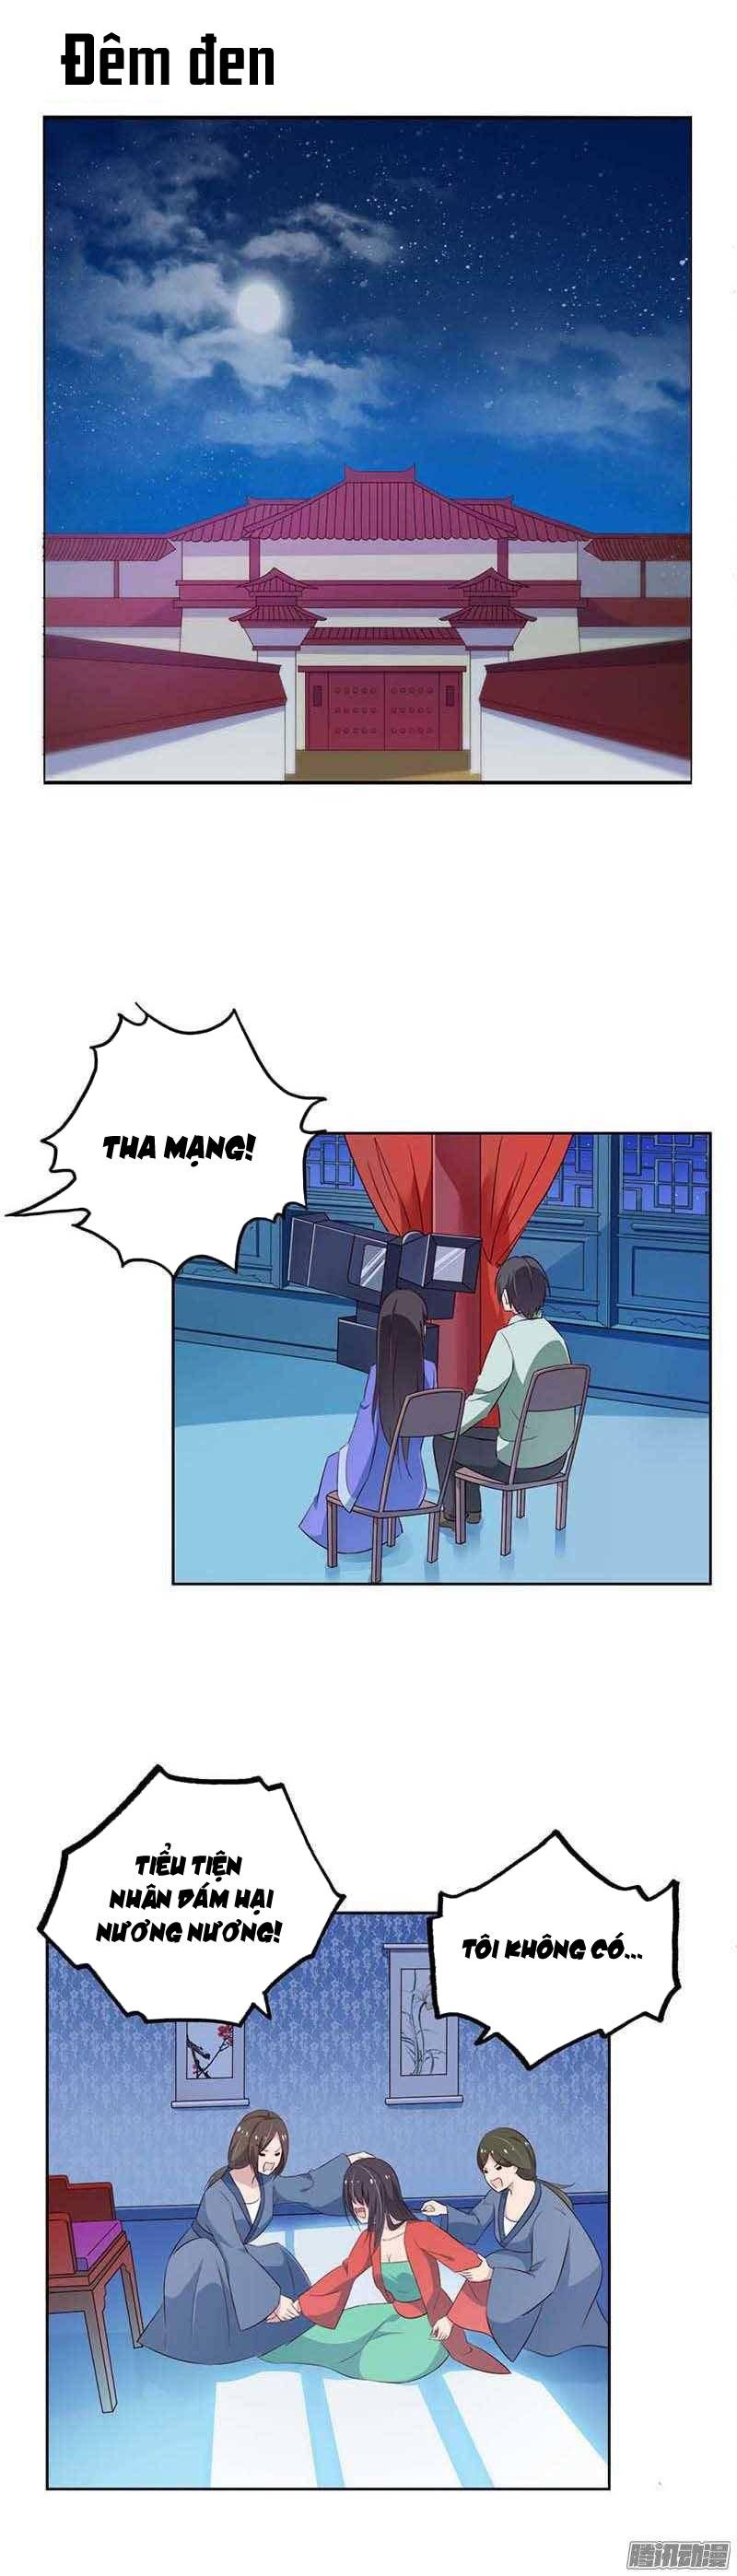 Bạn Trai Minh Tinh Bức Yêu Chap 21 - Next Chap 22